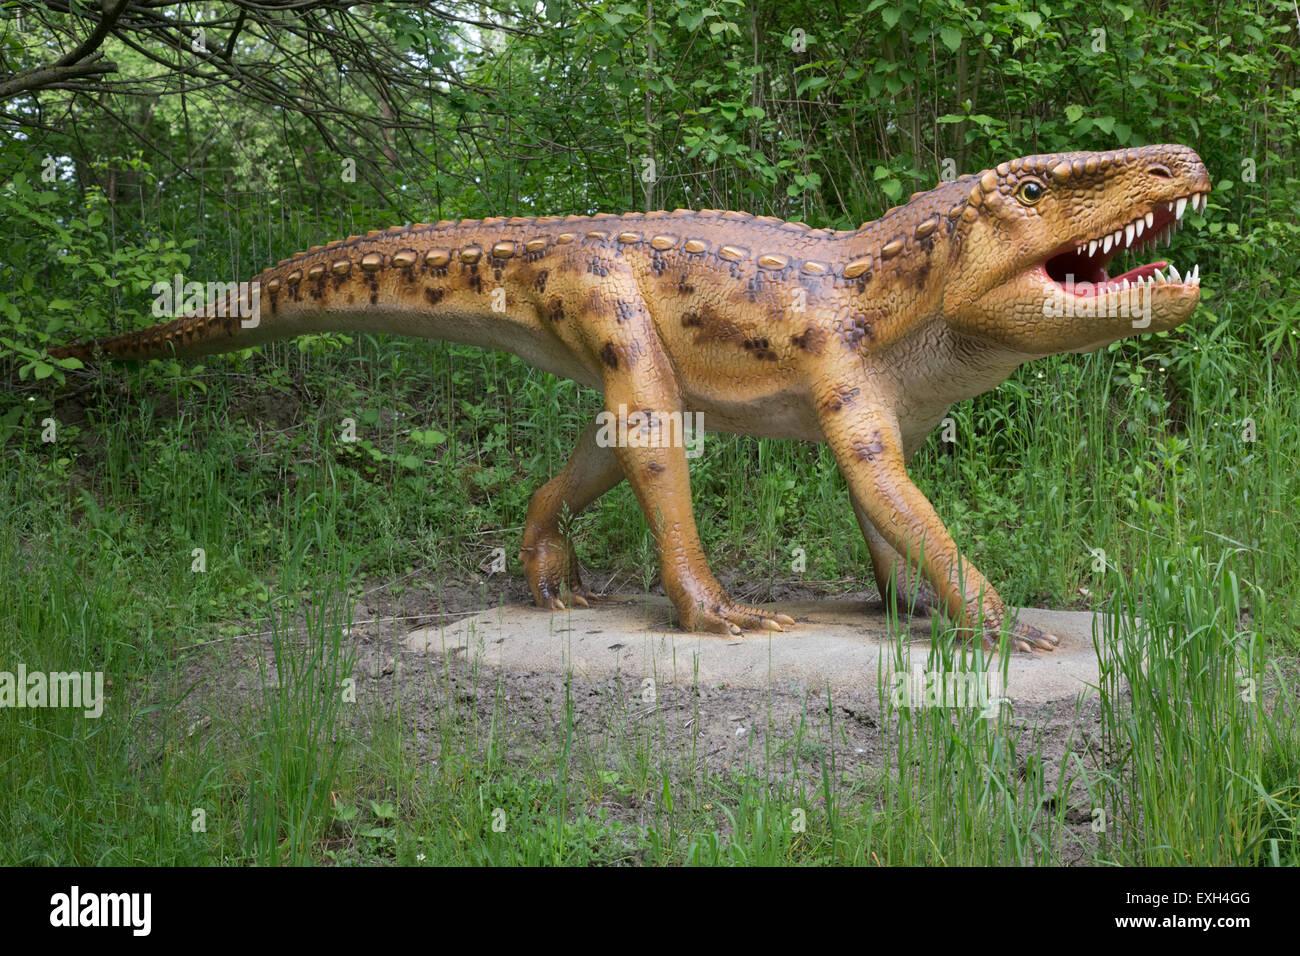 Ornithosuchus extinct Archsaur or bird crocodile Dinosaurier Park Triassic period Germany - Stock Image